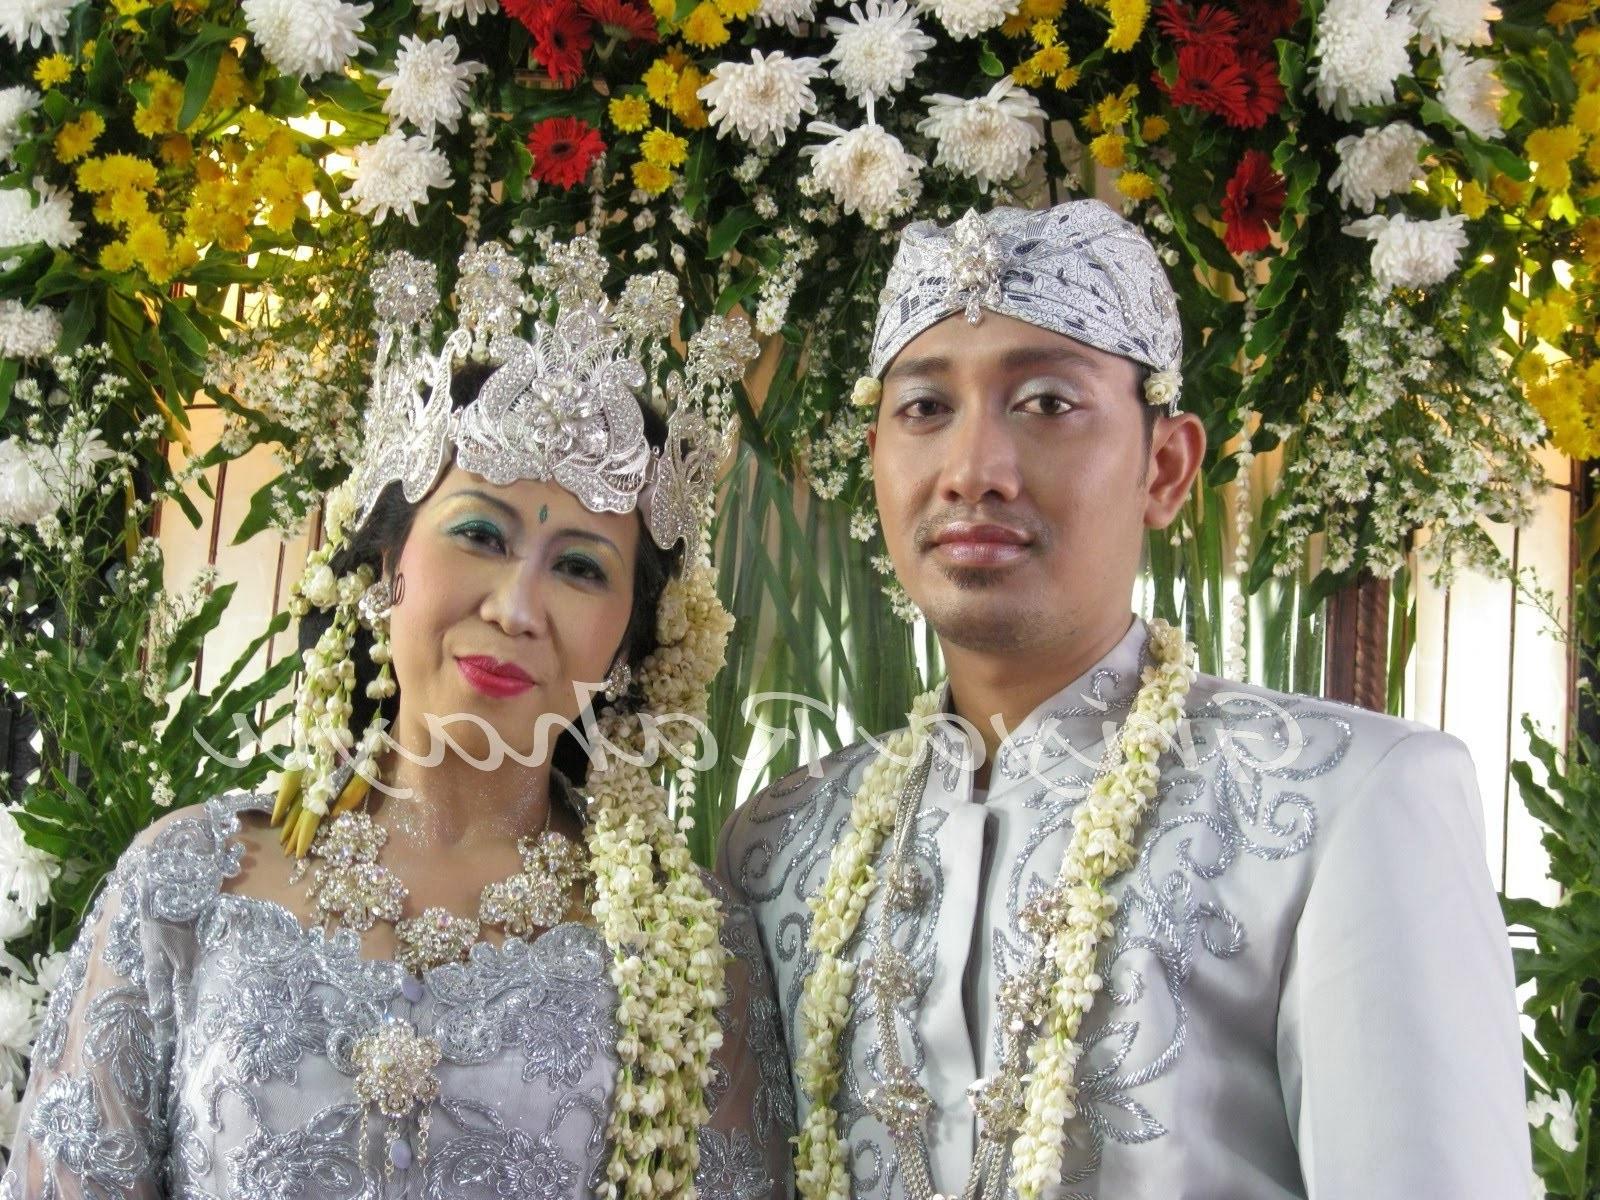 Inspirasi Gaun Pengantin Adat Sunda Muslim Ftd8 Baru Baju Pengantin Adat Lampung Berhijab